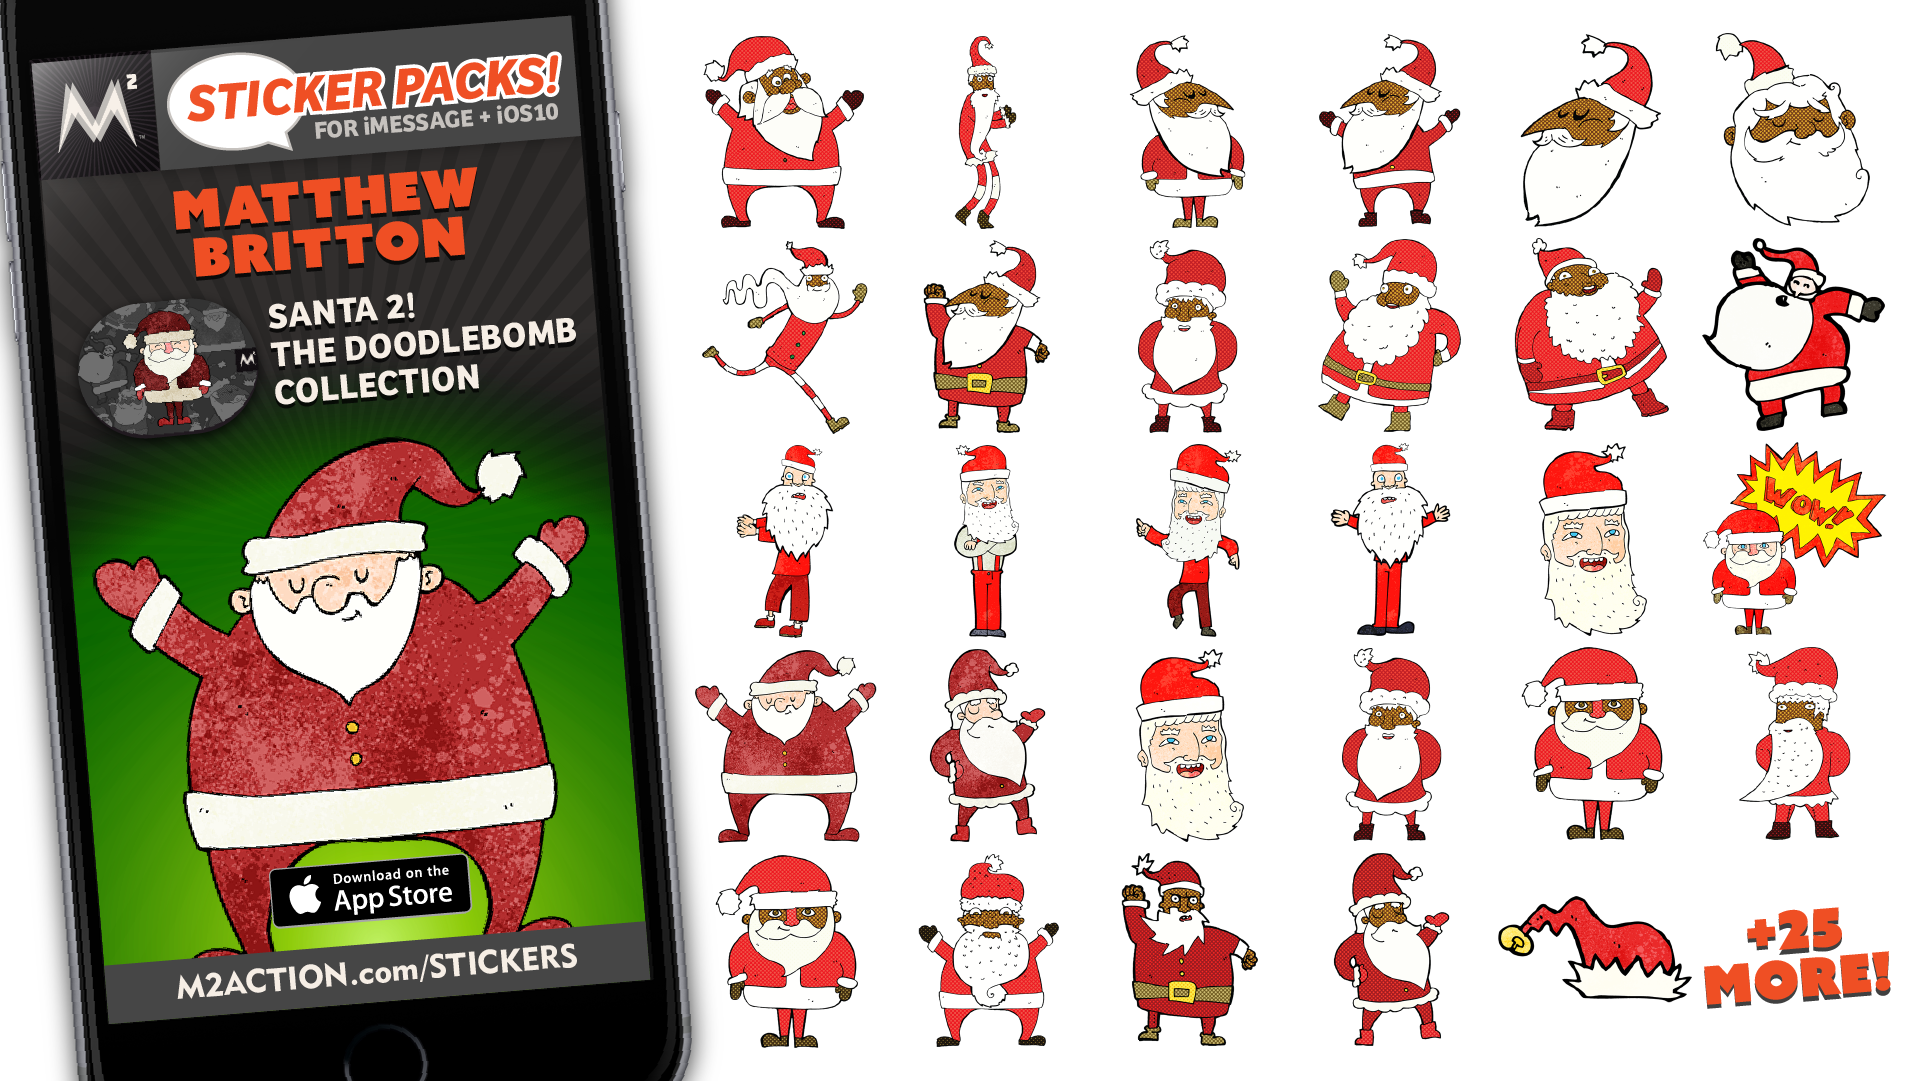 M2_Stickers_Promos_Dec2016_MatthewBritton_DoodleBomb_Santa2.png